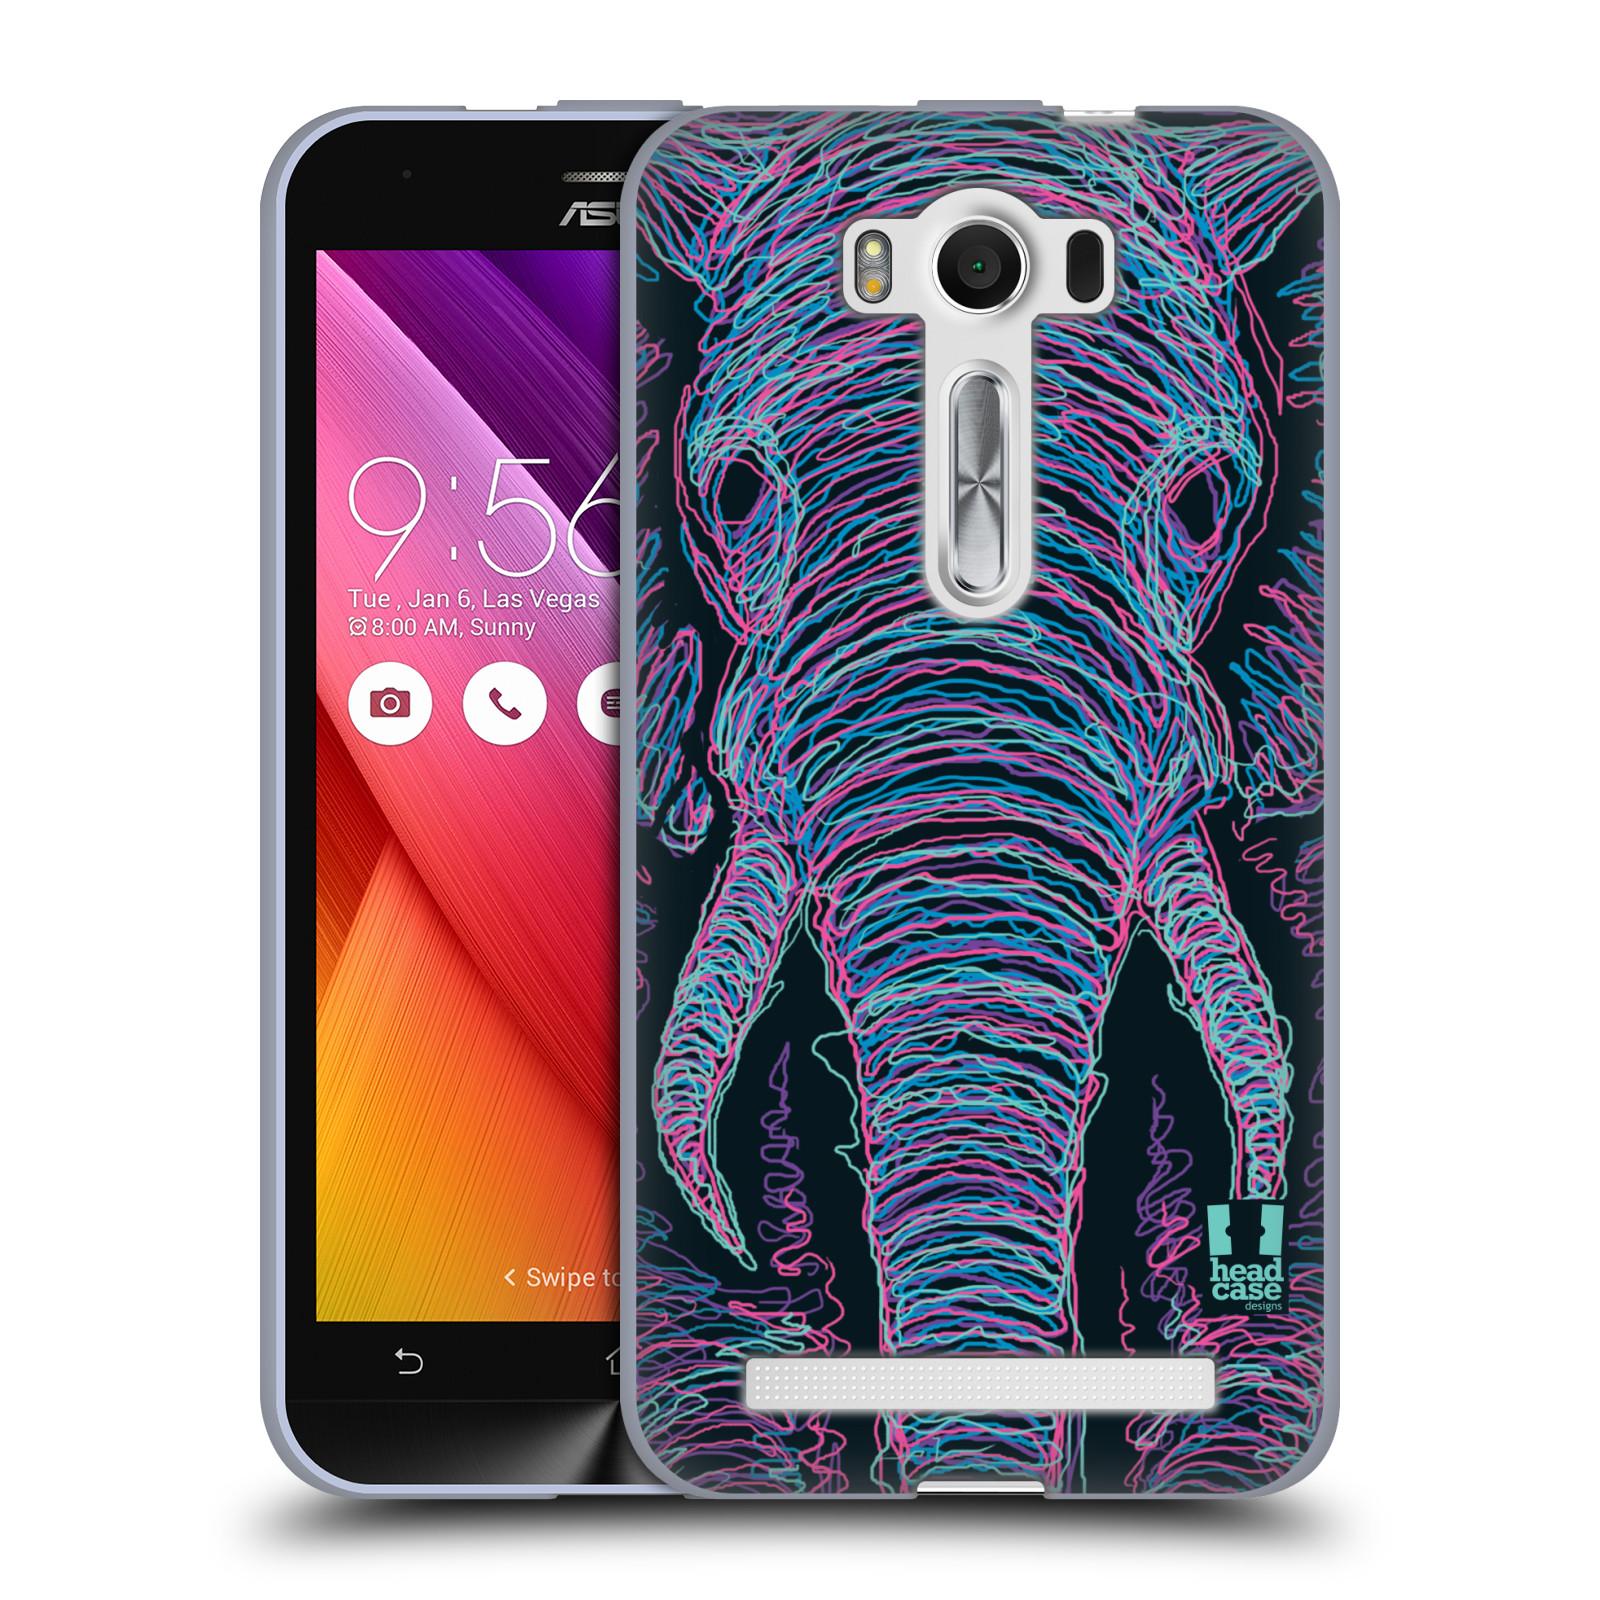 "HEAD CASE silikonový obal na mobil Asus Zenfone 2 LASER (ZE500KL s 5"" displejem) vzor zvíře čmáranice slon"